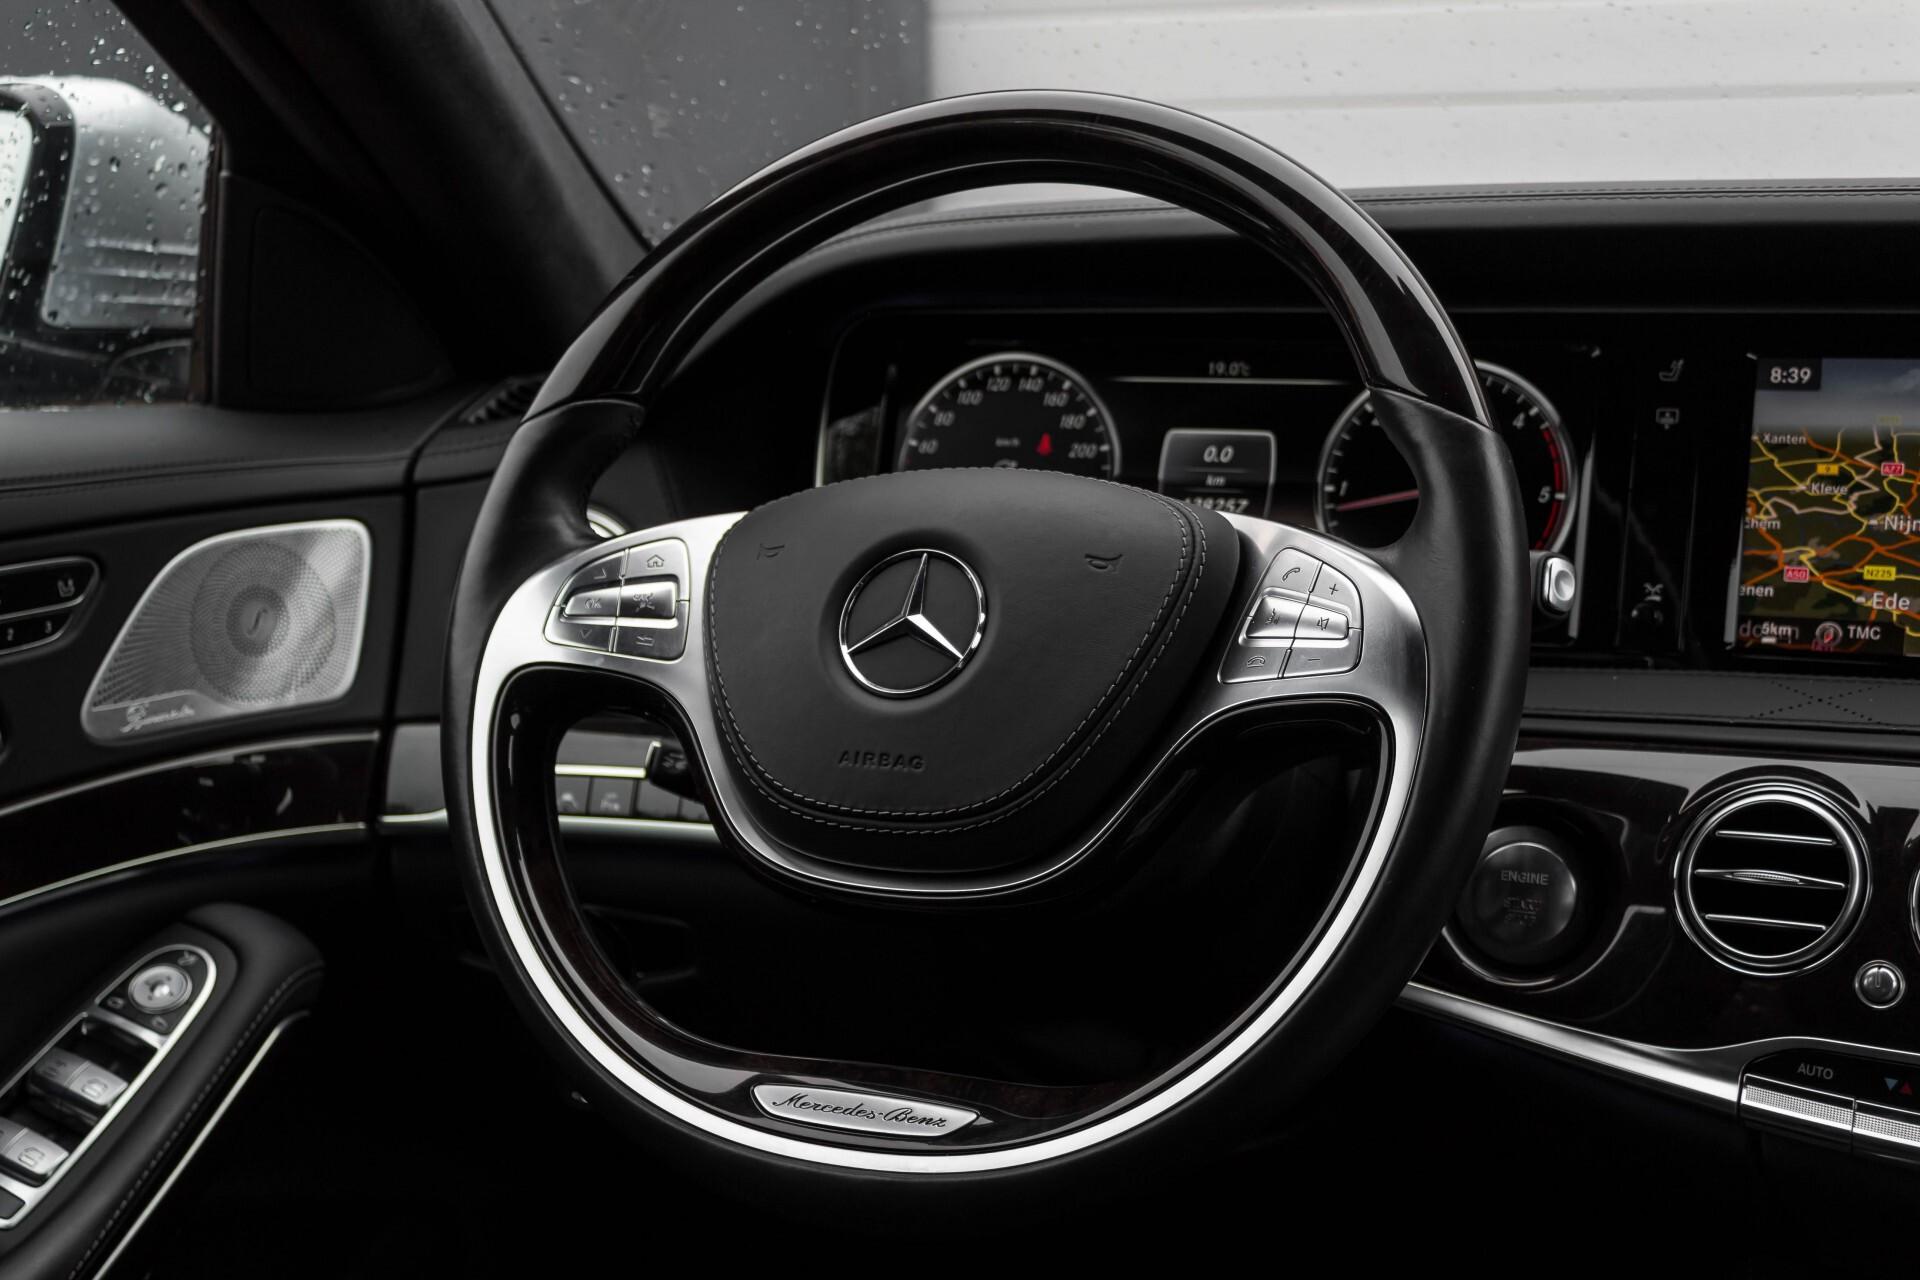 Mercedes-Benz S-Klasse 350 Bluetec Exclusive Panorama/Massage/Keyless/Distronic/Standkachel Aut7 Foto 8